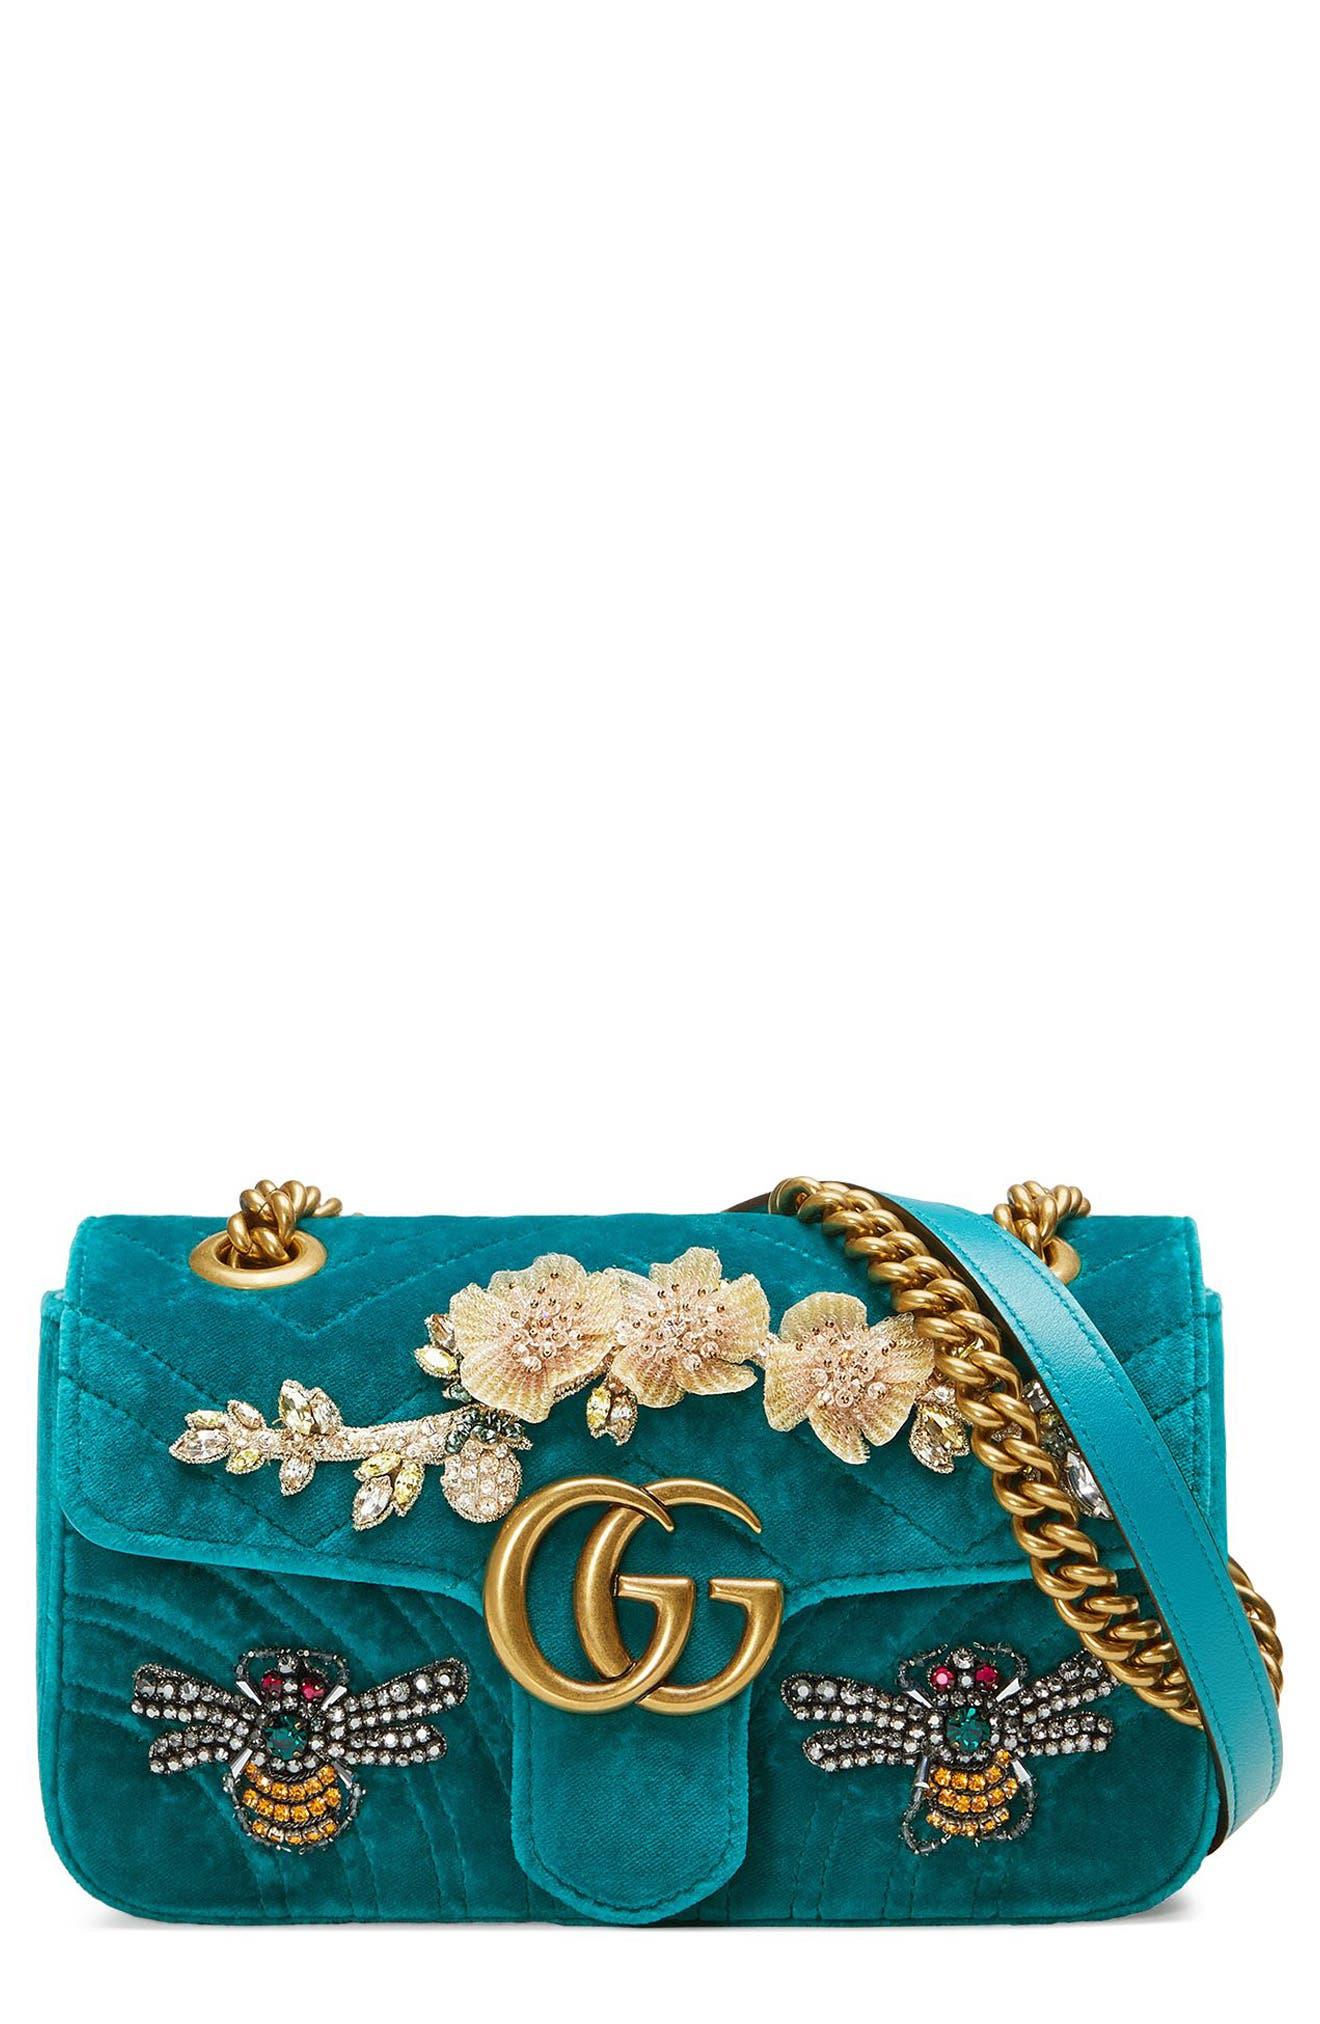 Mini GG Marmont Matelassé Velvet Shoulder Bag,                             Main thumbnail 1, color,                             Pivone